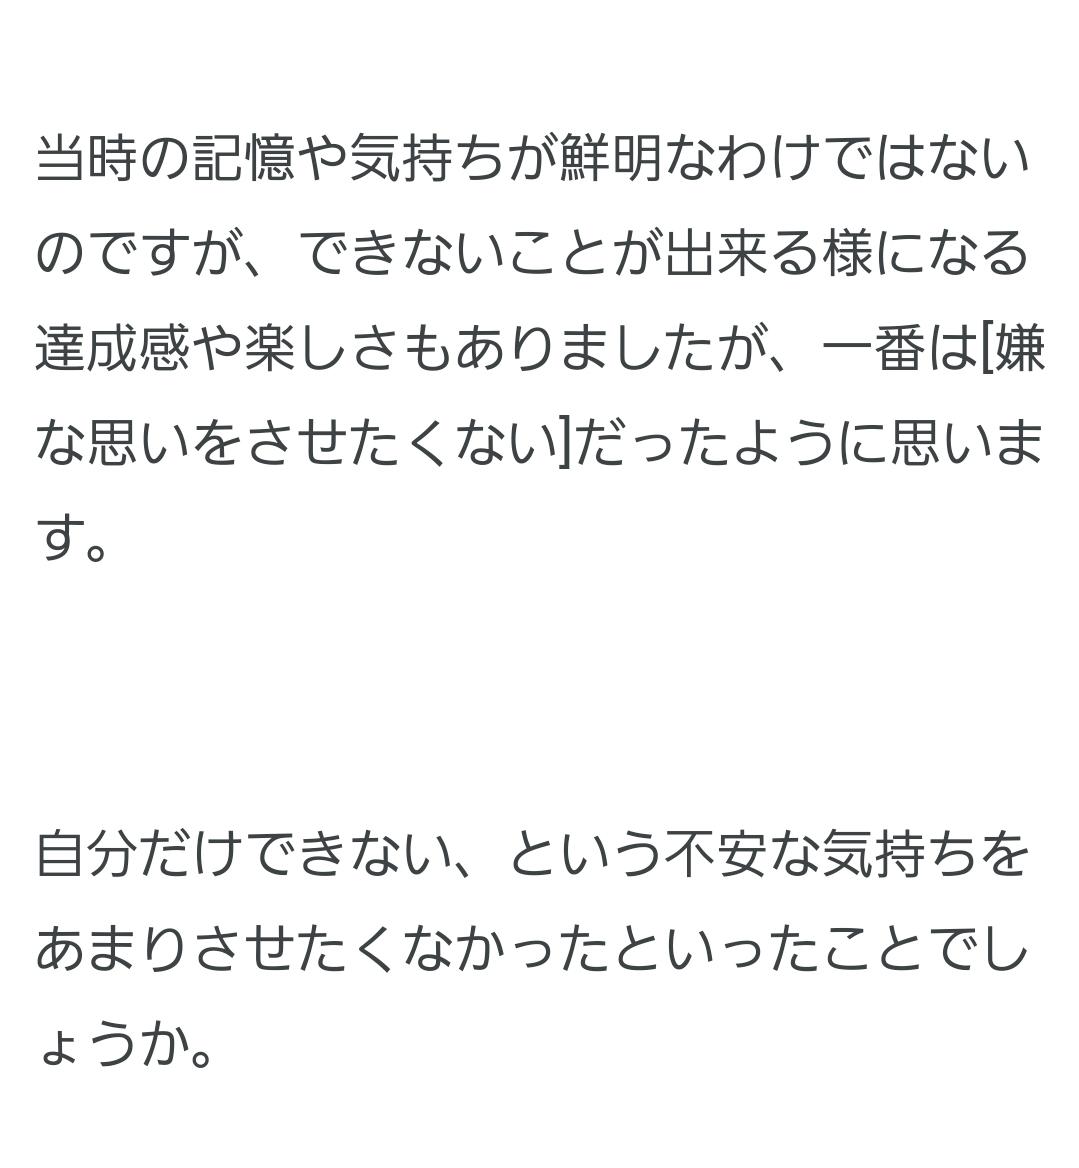 f:id:kyobachan:20210522163143j:plain